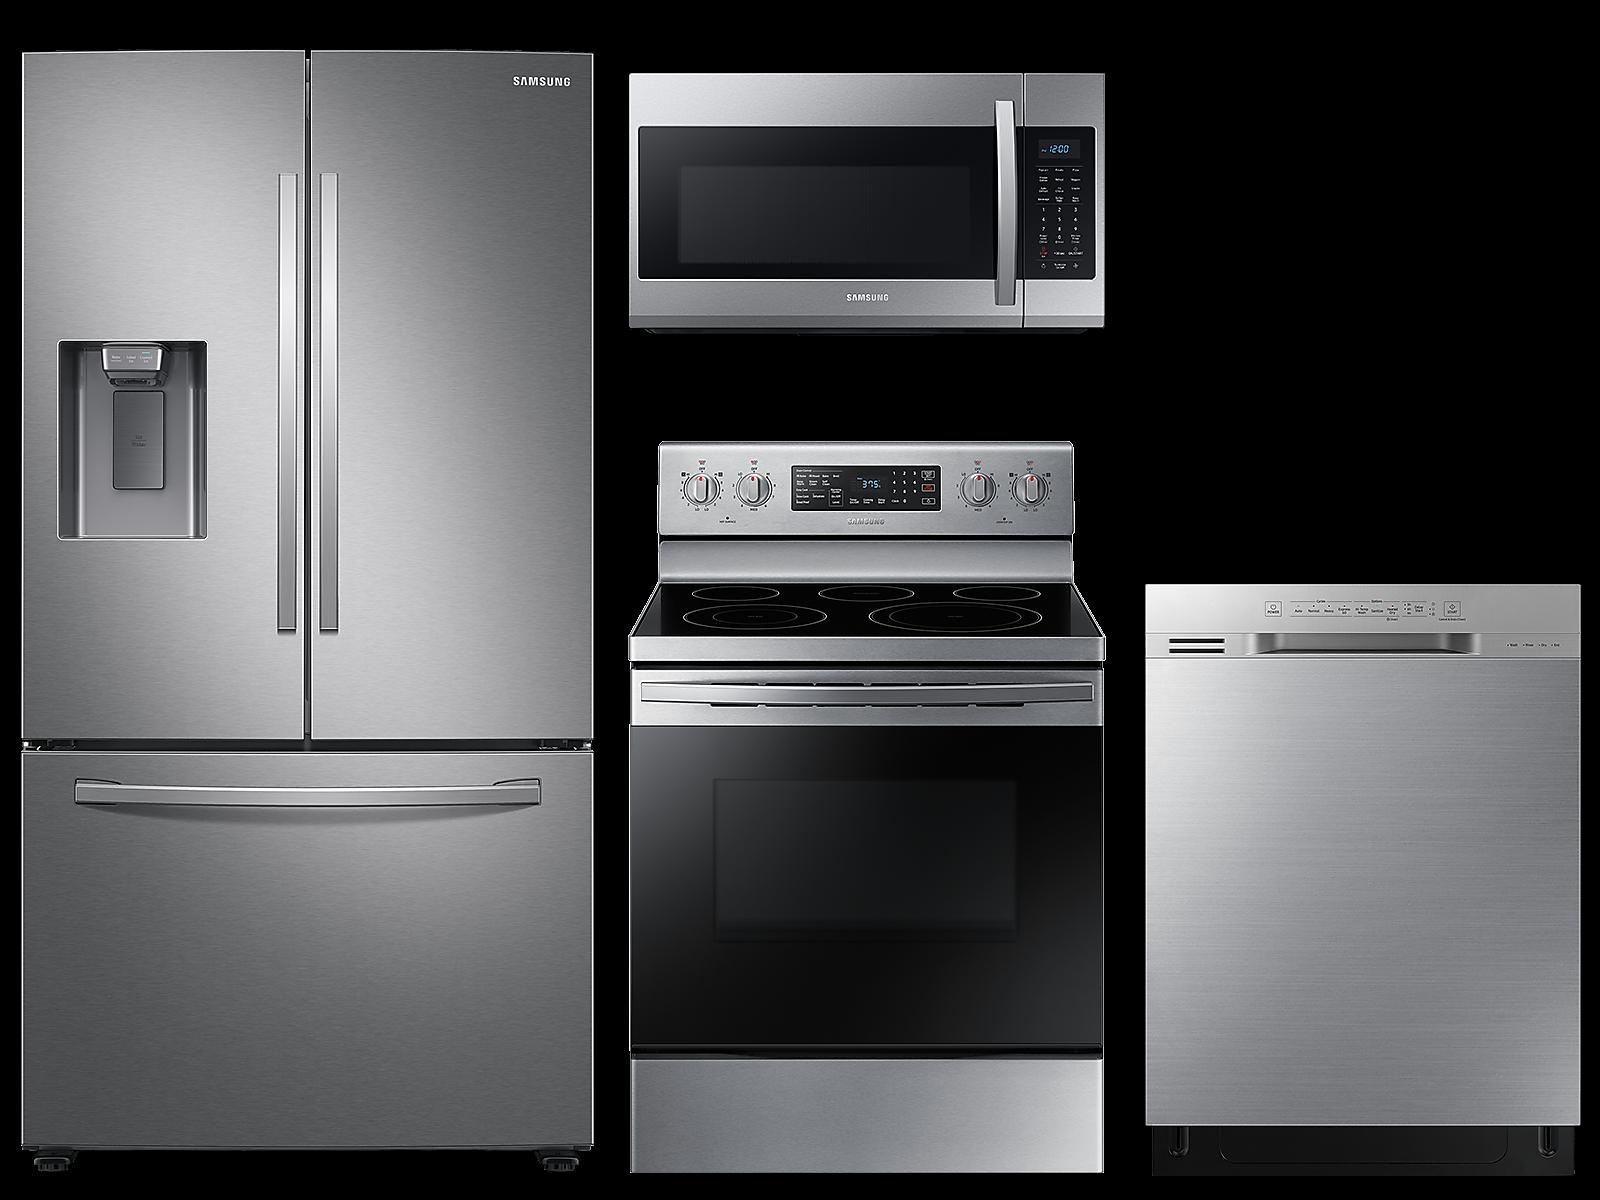 Samsung coupon: Samsung Large capacity 3-door refrigerator & electric range package in Stainless Steel(BNDL-1590161274268)